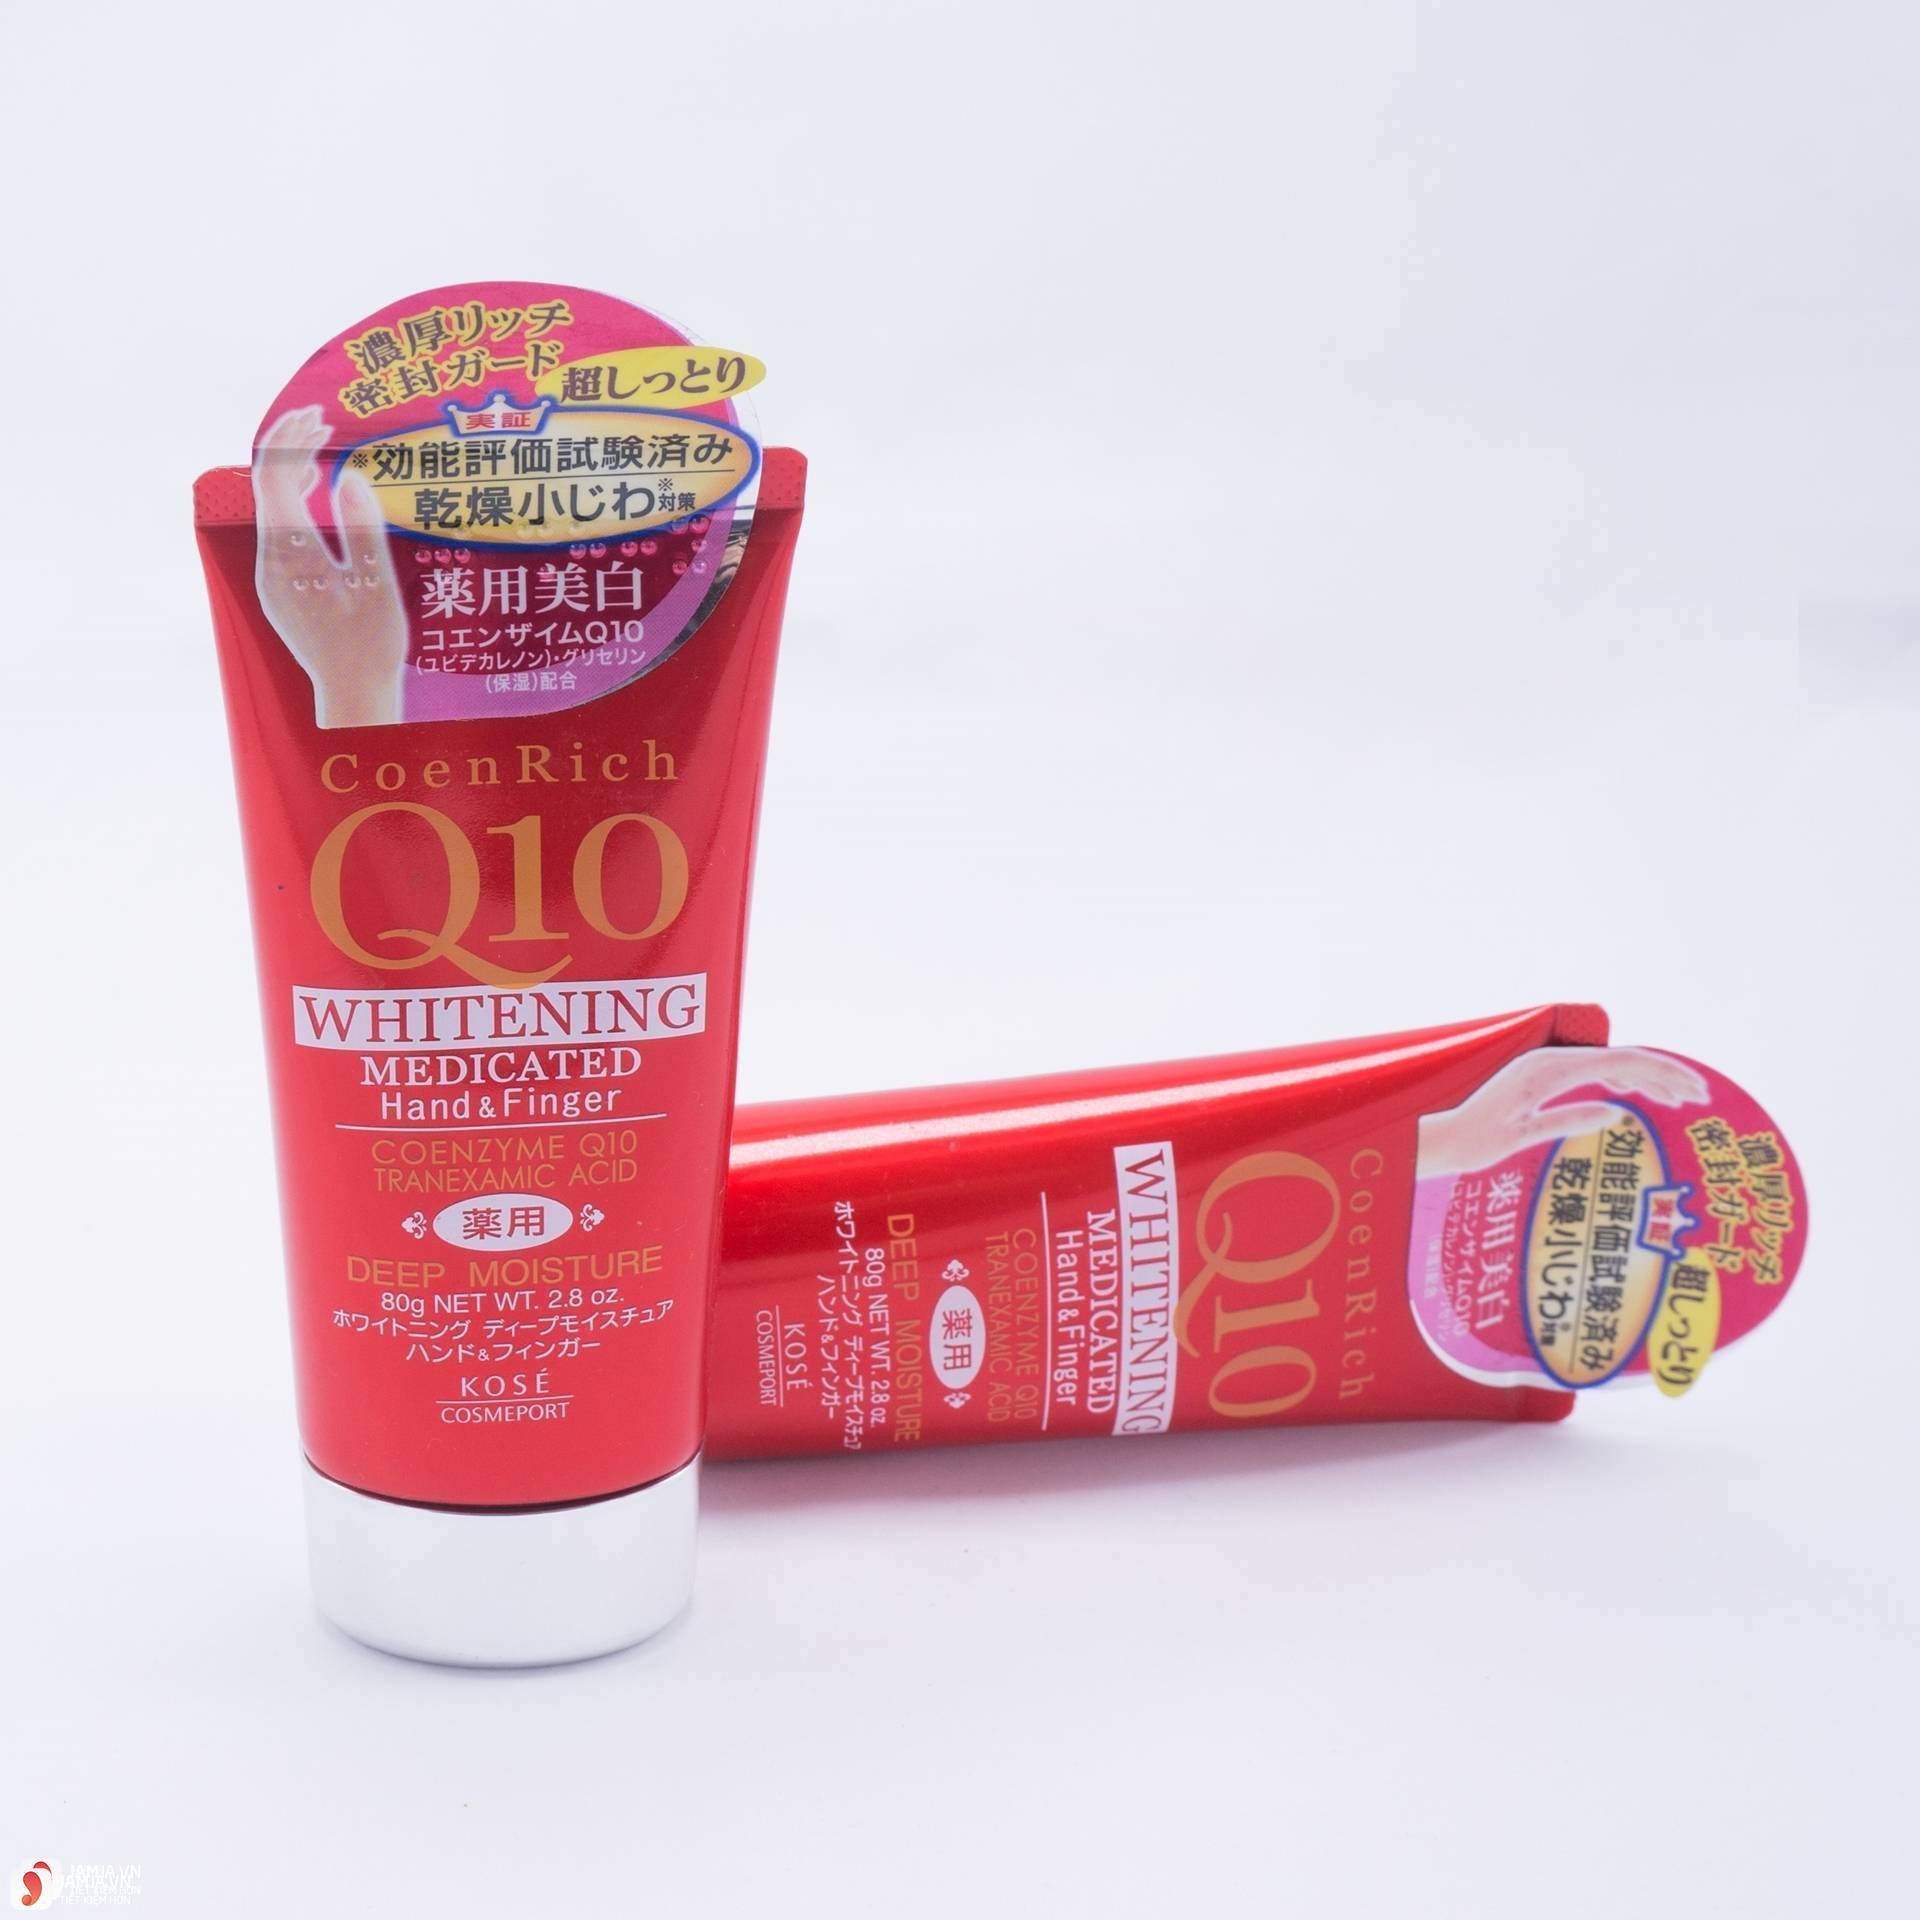 Kem dưỡng da tayKose Q10 Whitening Medicated Hand & Finger mức giá tốt